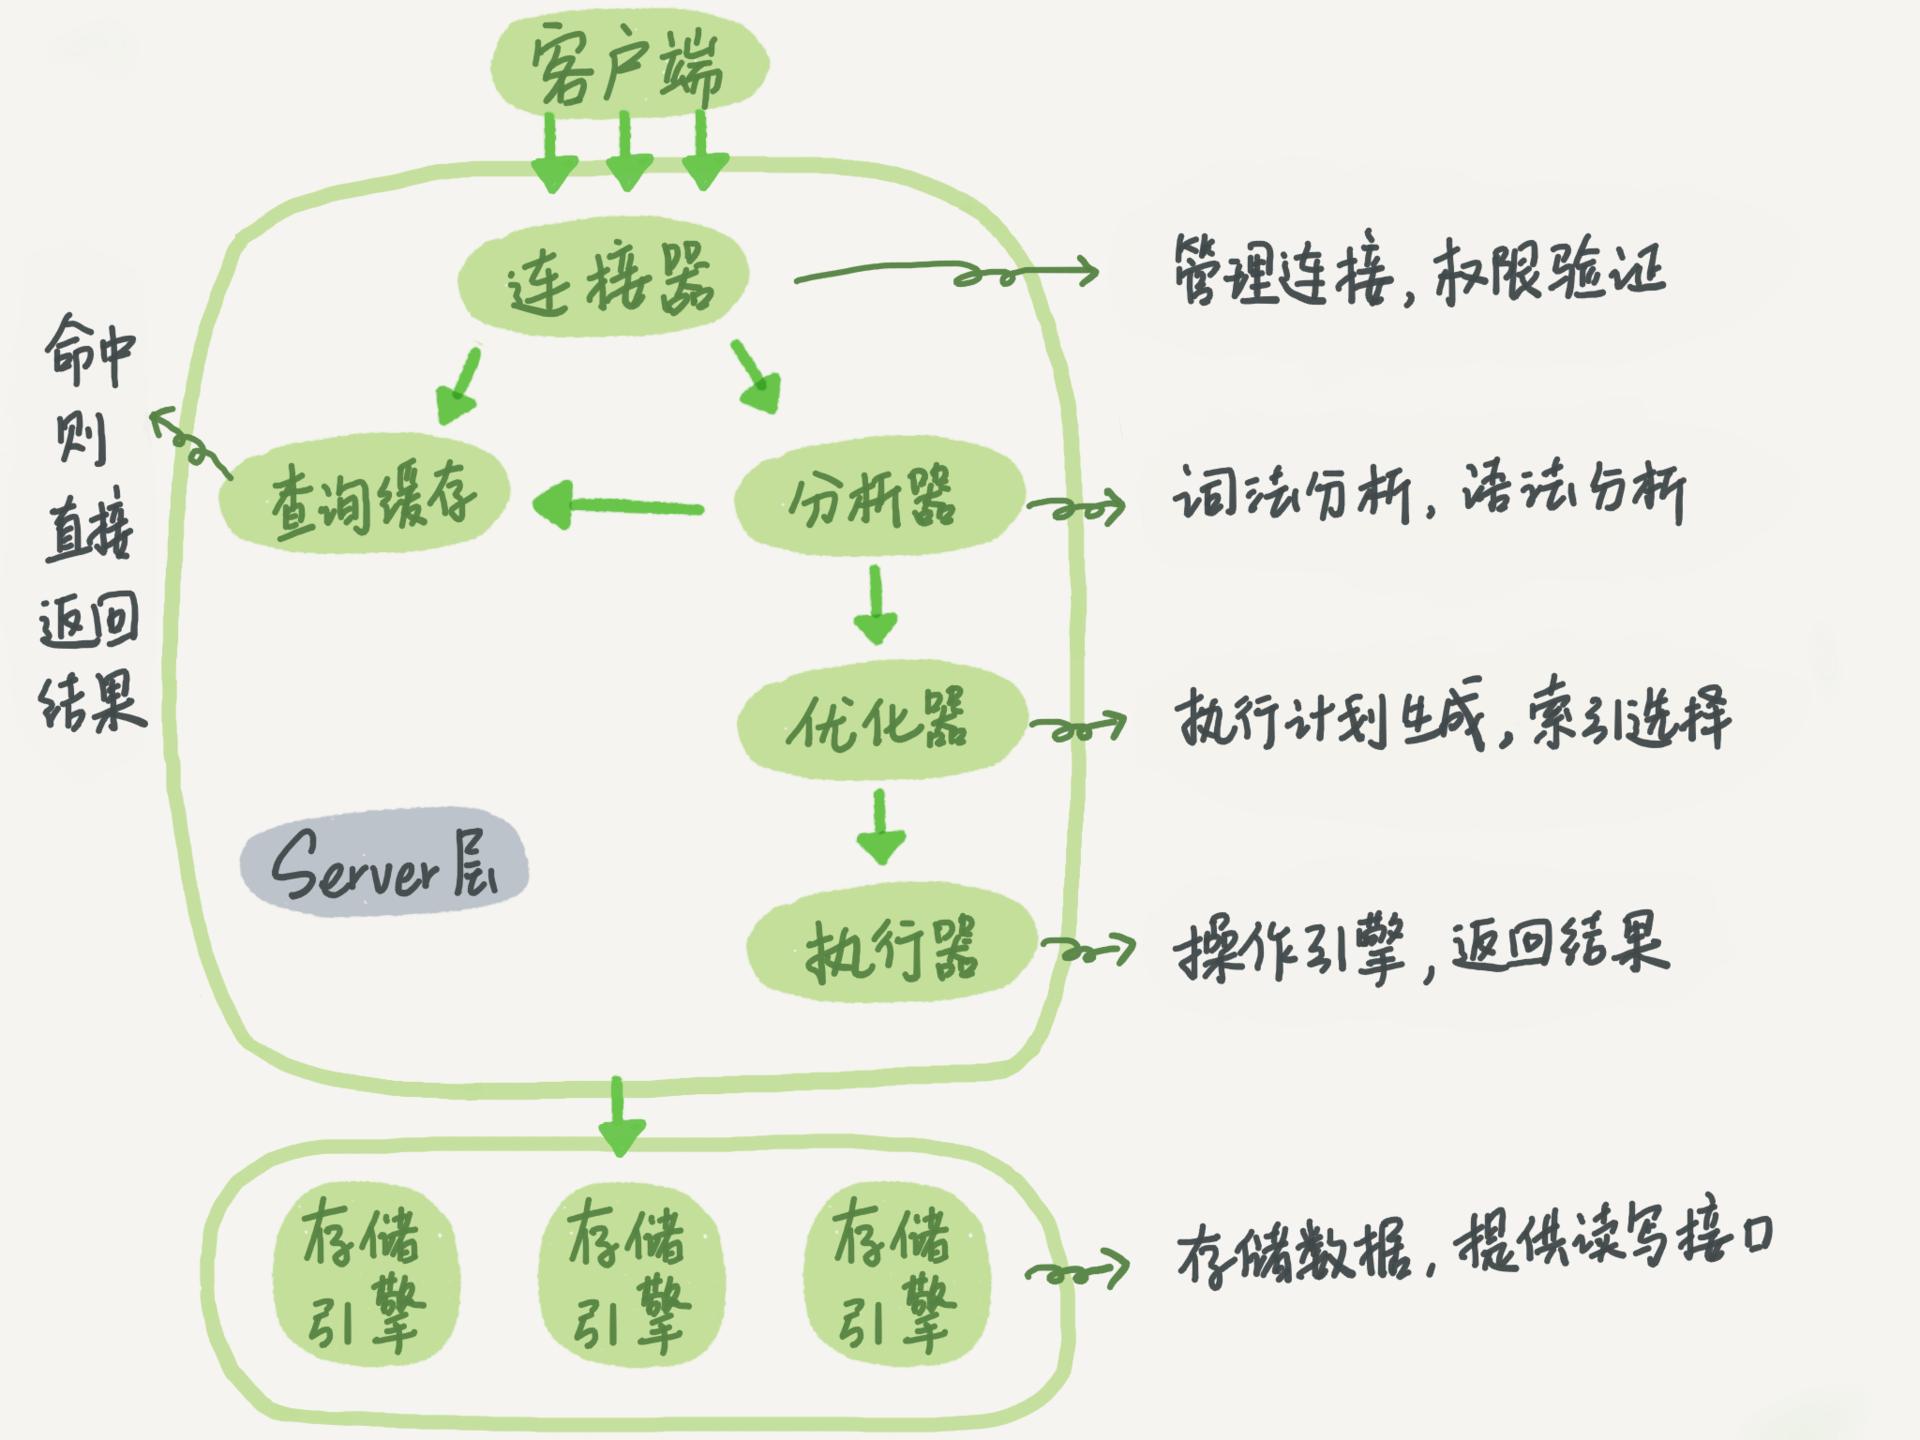 MySQL 的基本架构